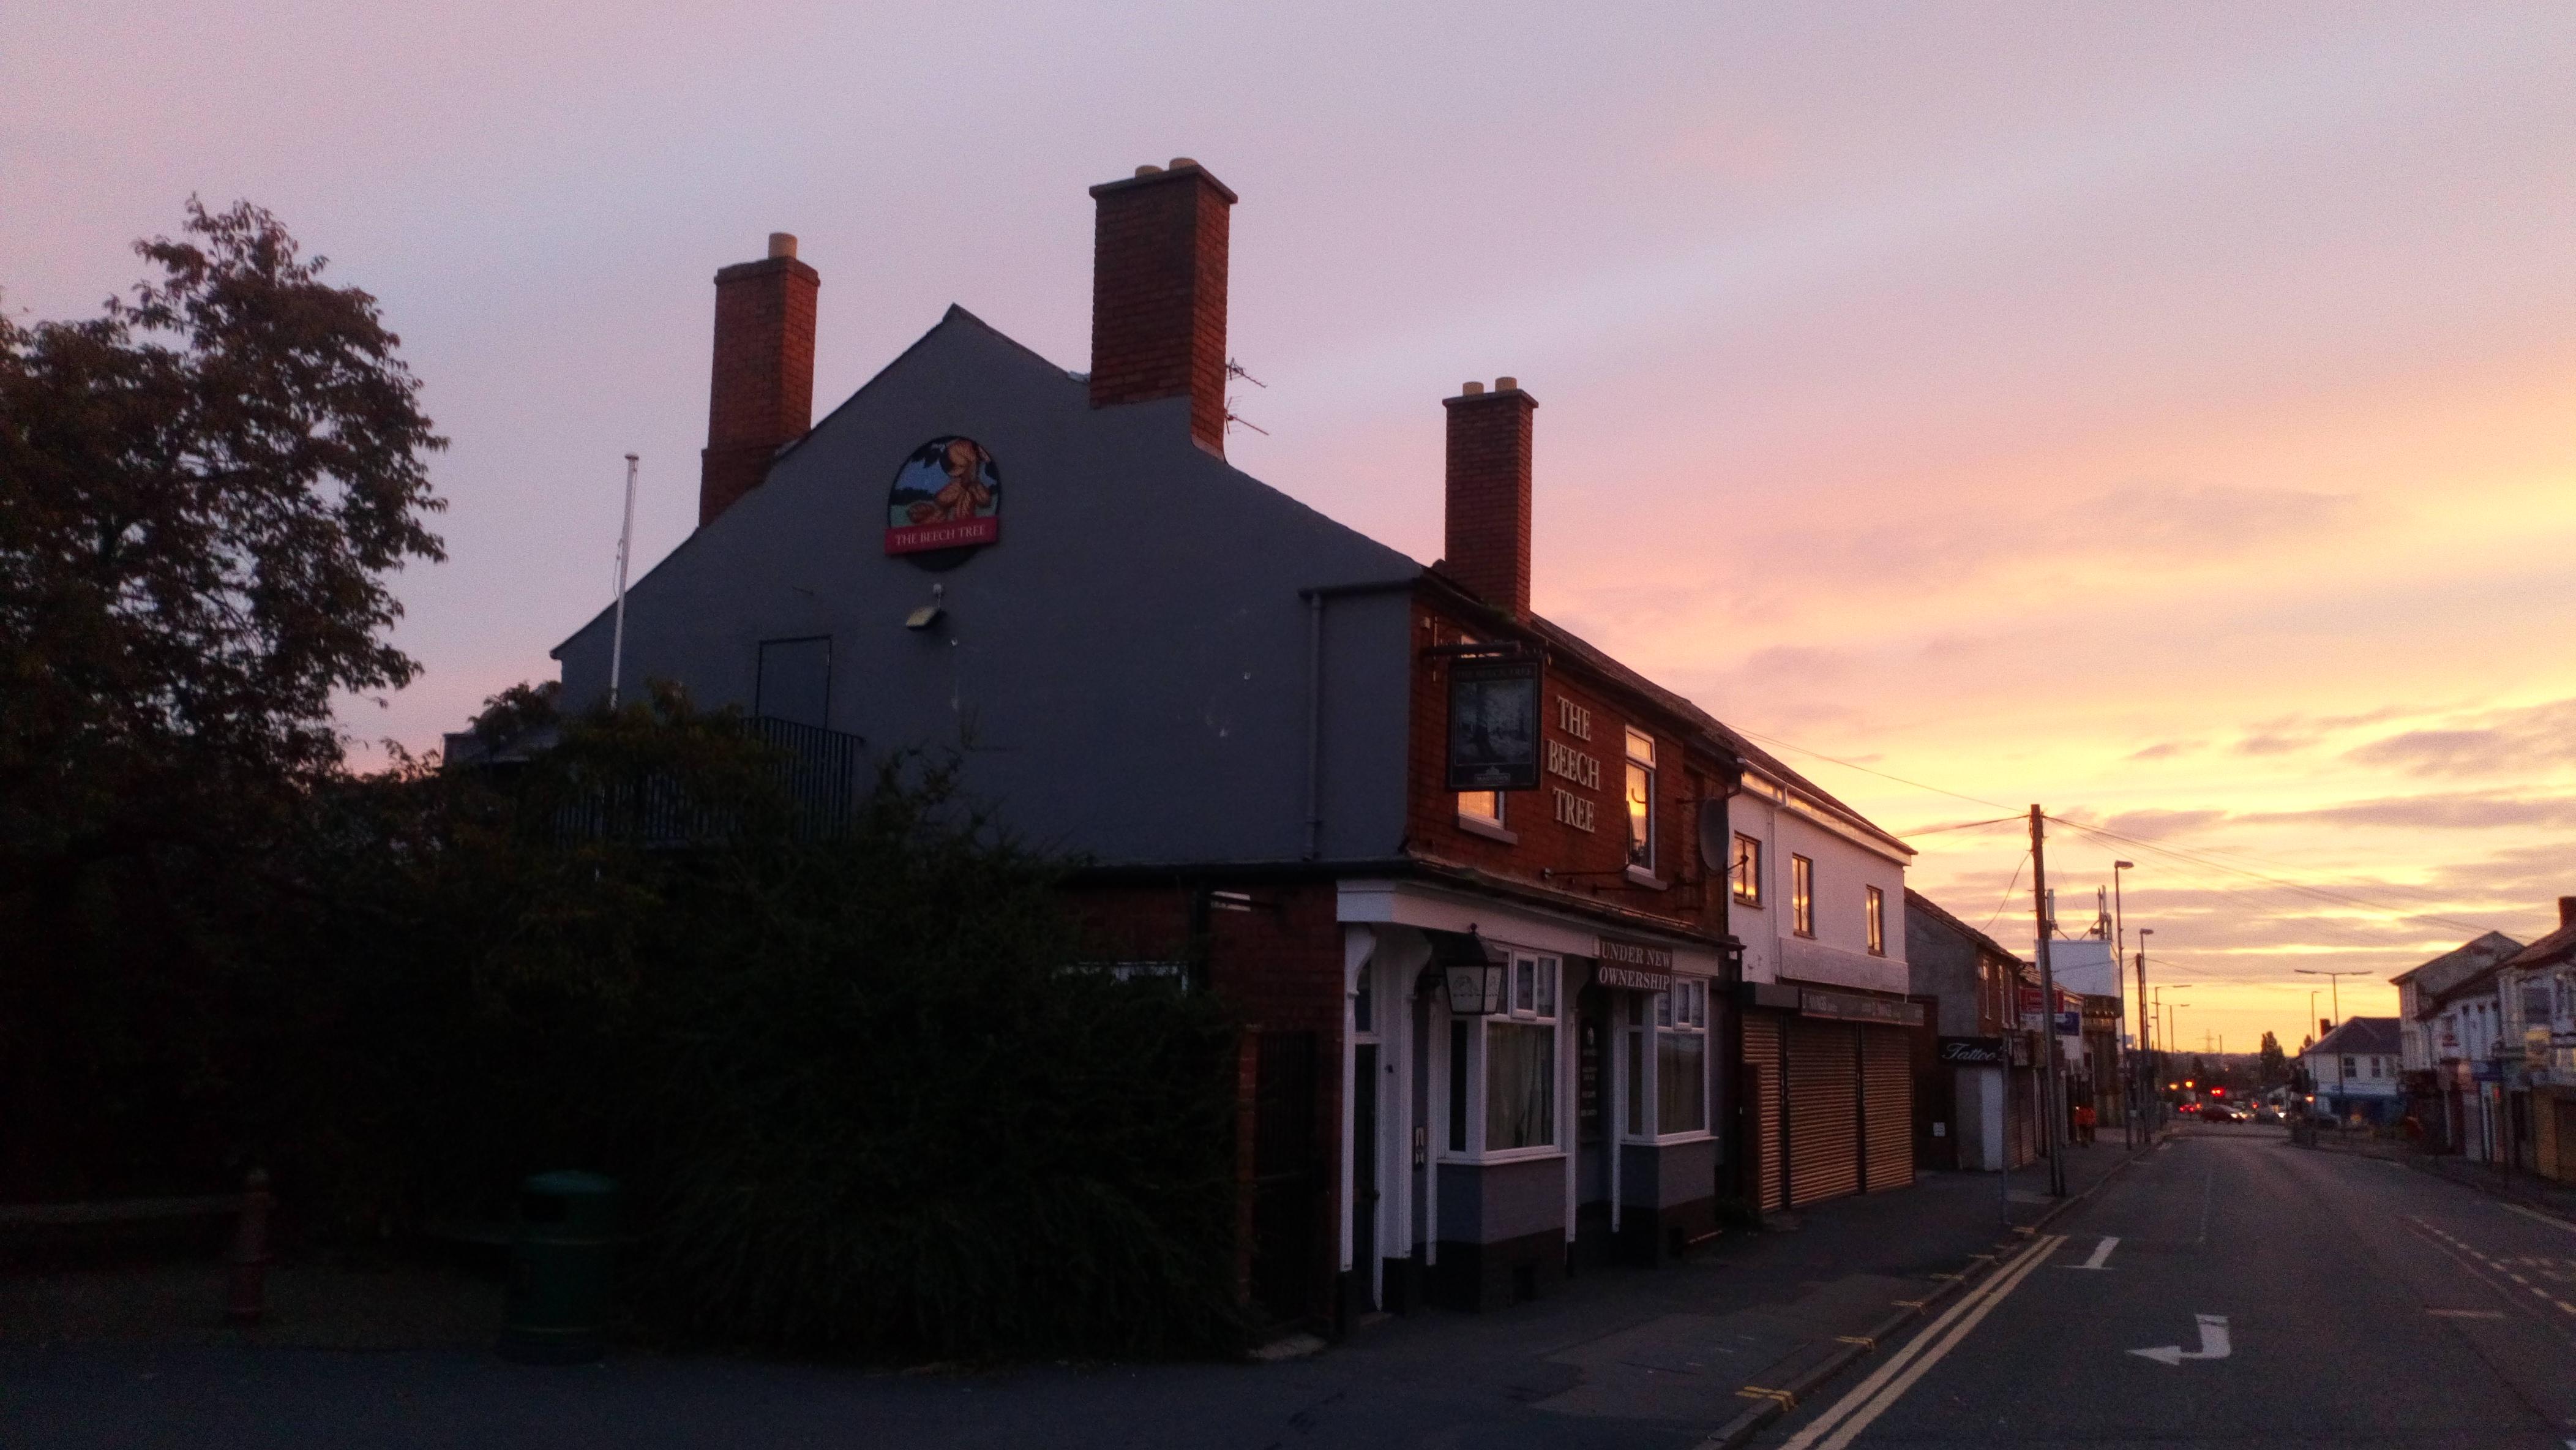 The-Beech-Tree-Pub-Halesowen-Road-Blackheath